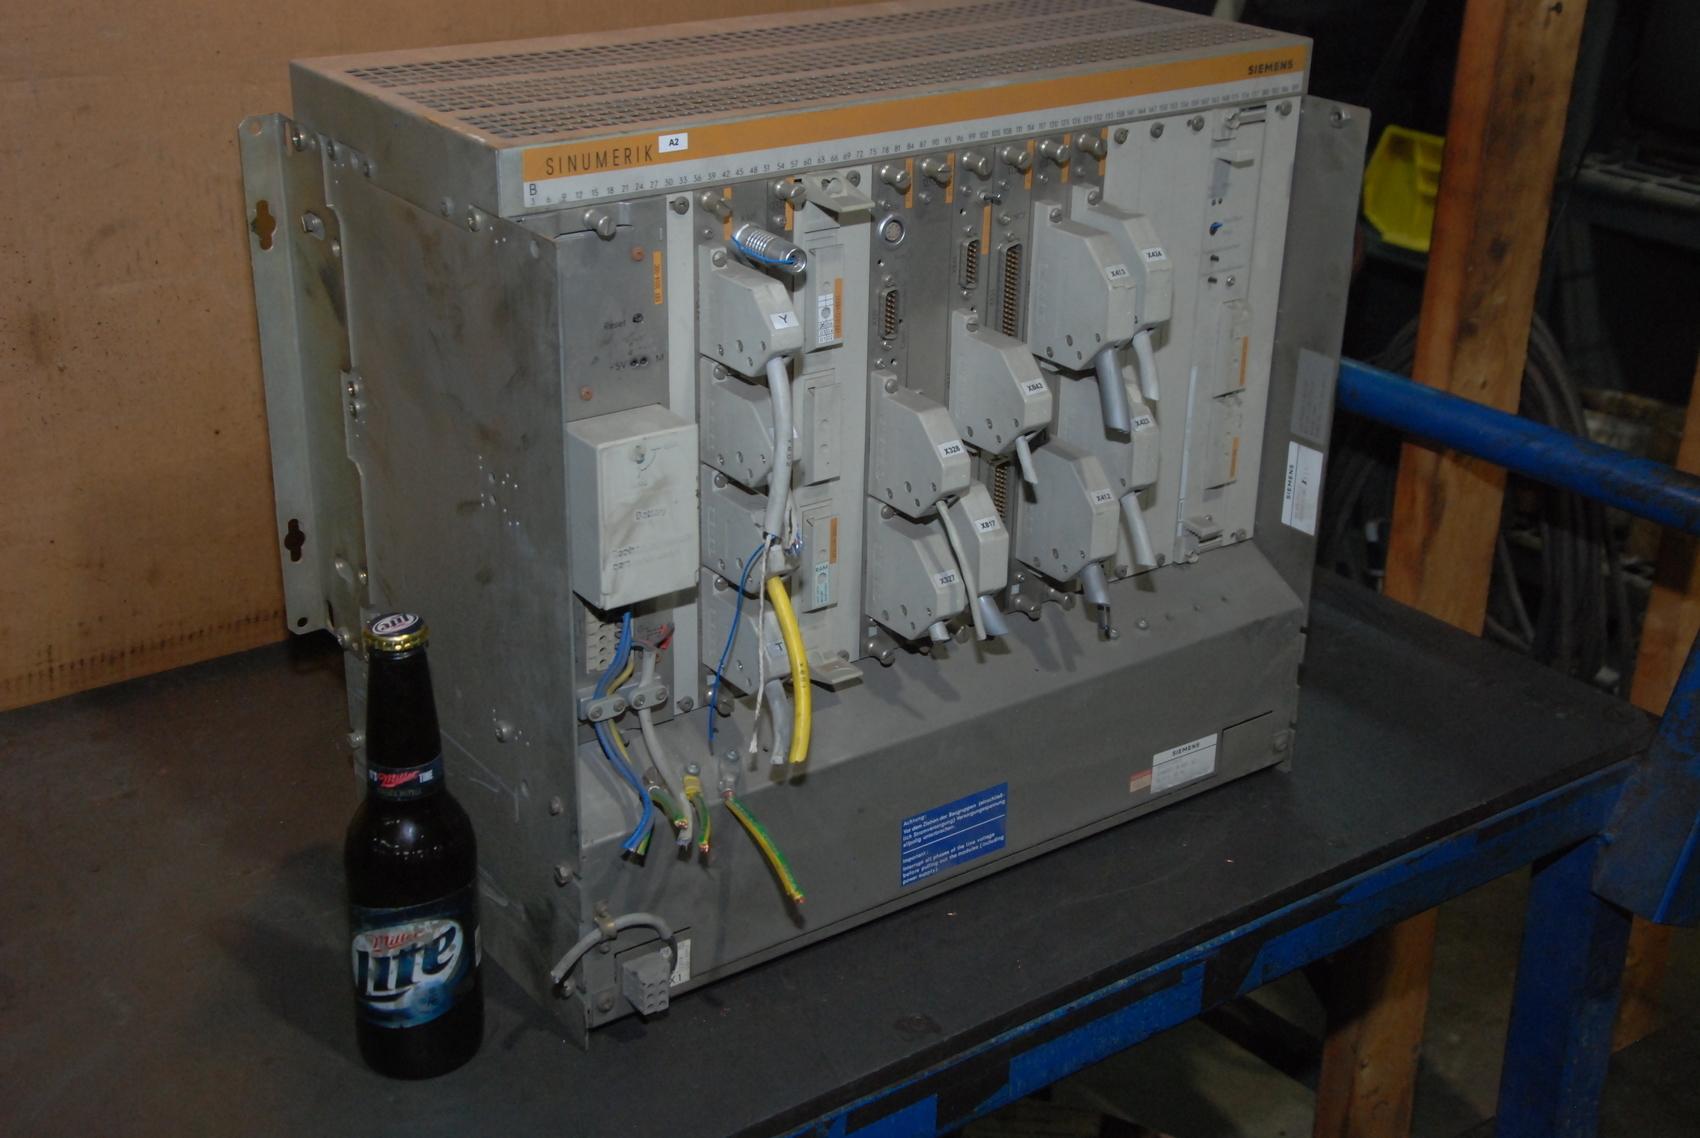 siemens sinumerik computer with boards 3n ausf 4c